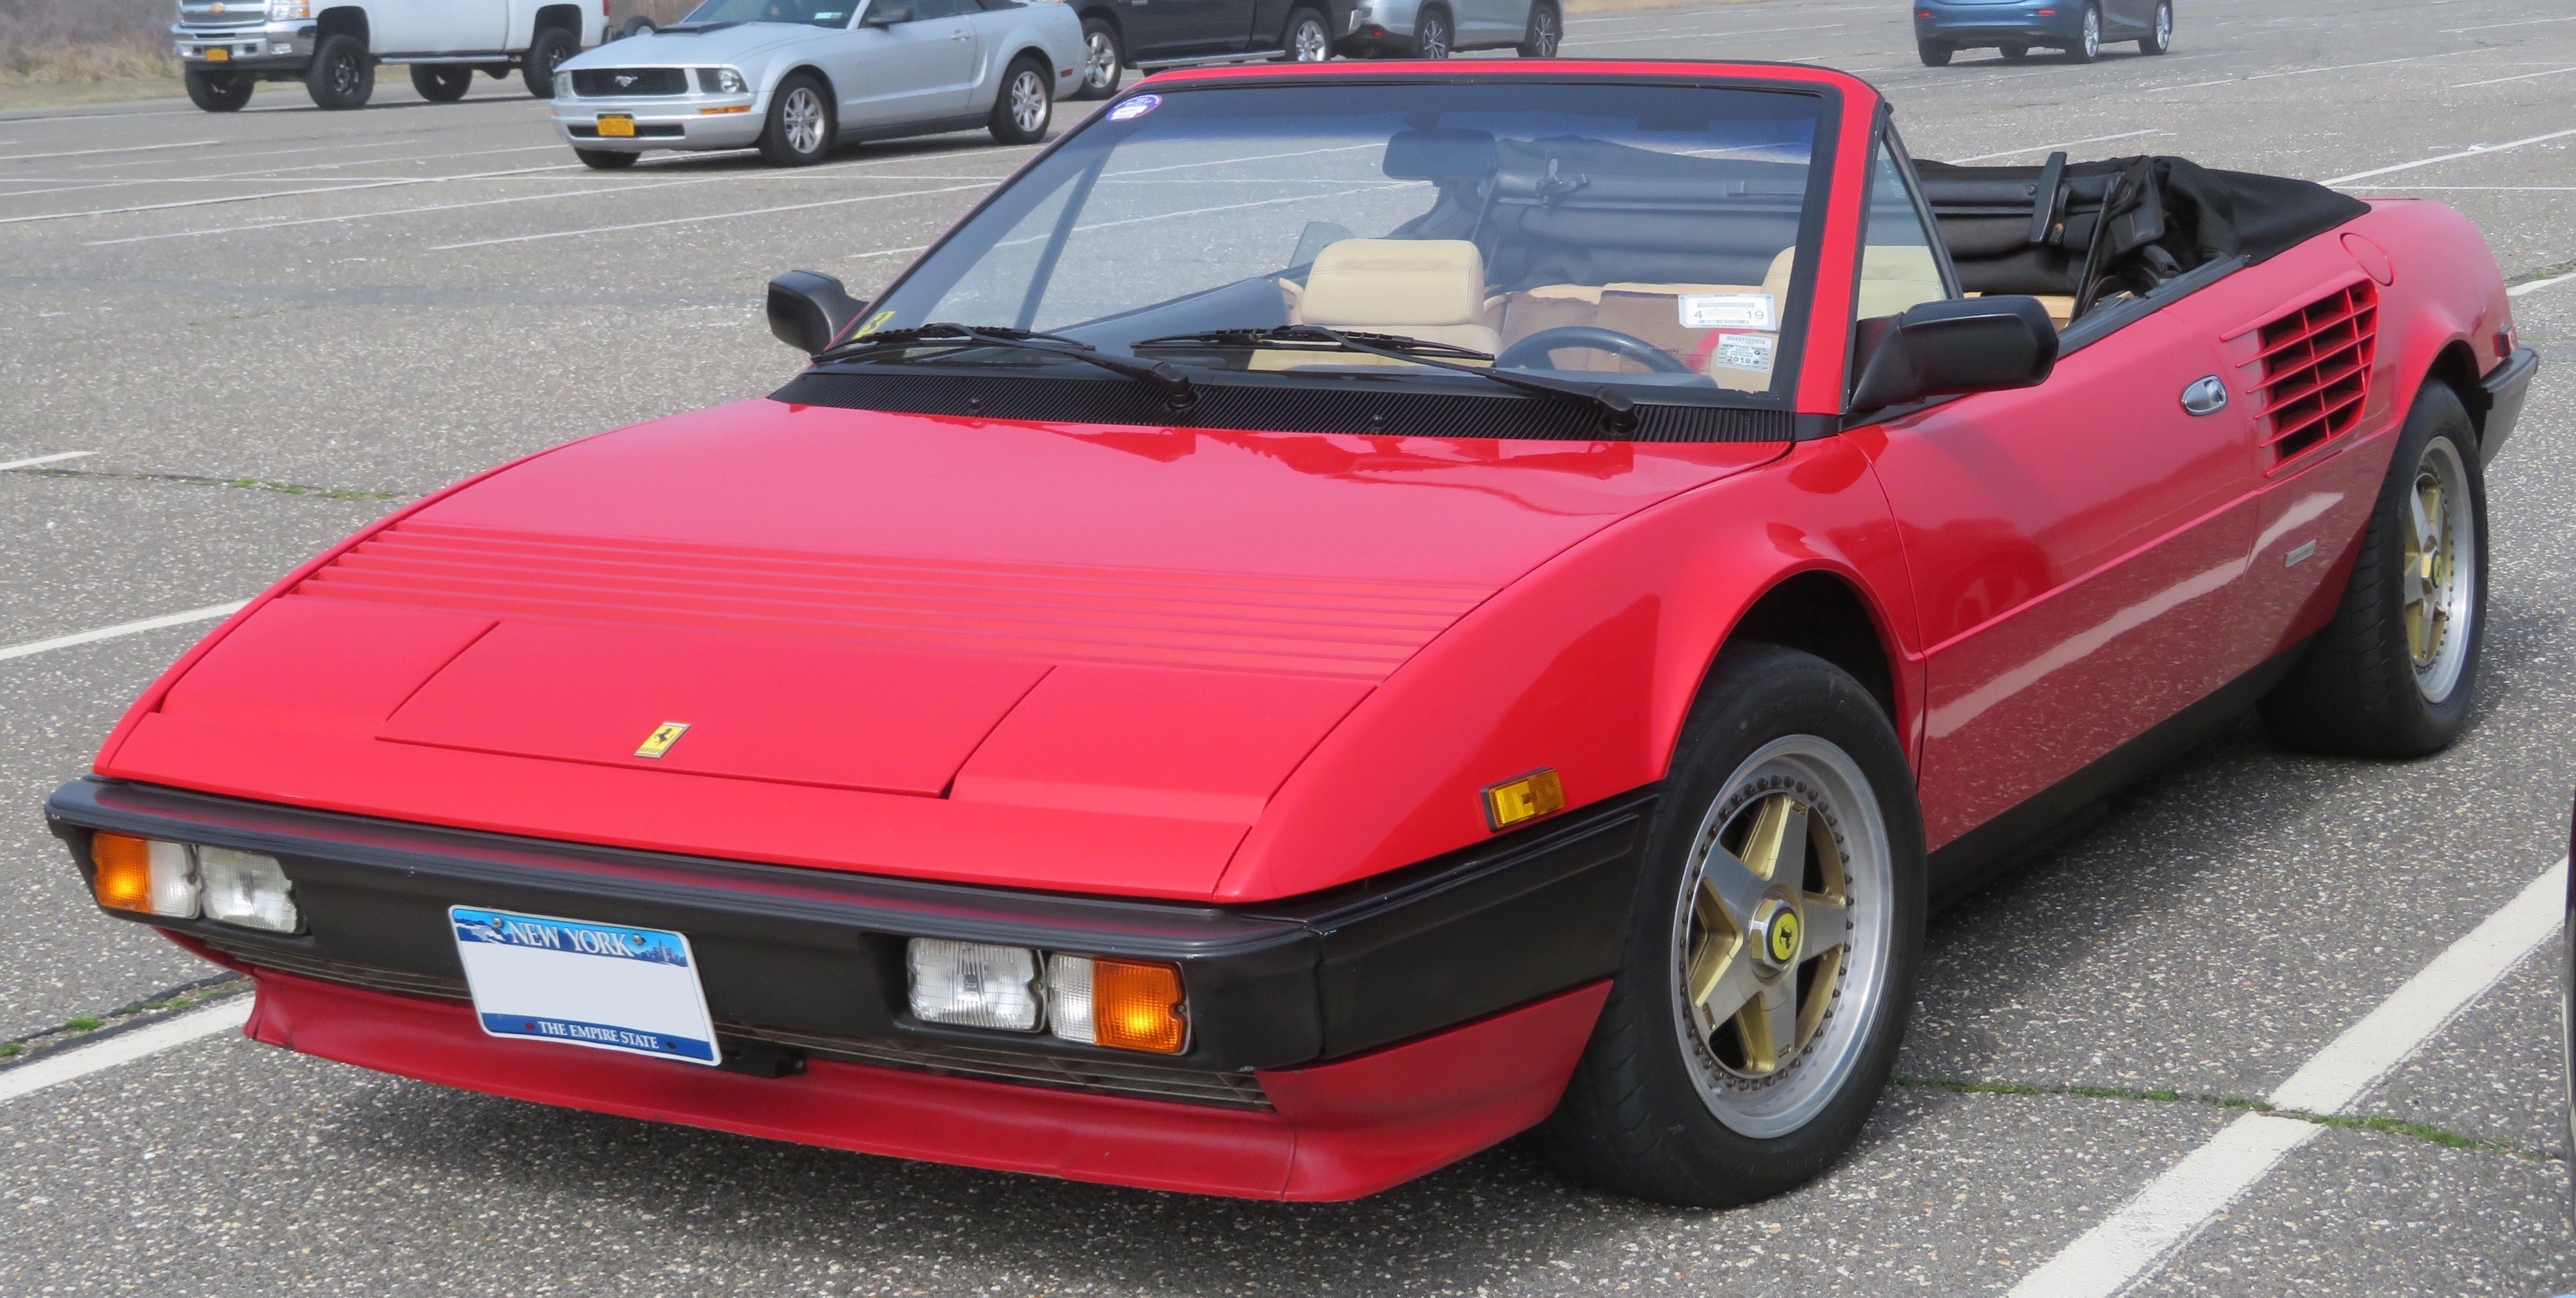 File 1984 Ferrari Mondial Cabriolet Front 4 28 18 Jpg Wikimedia Commons